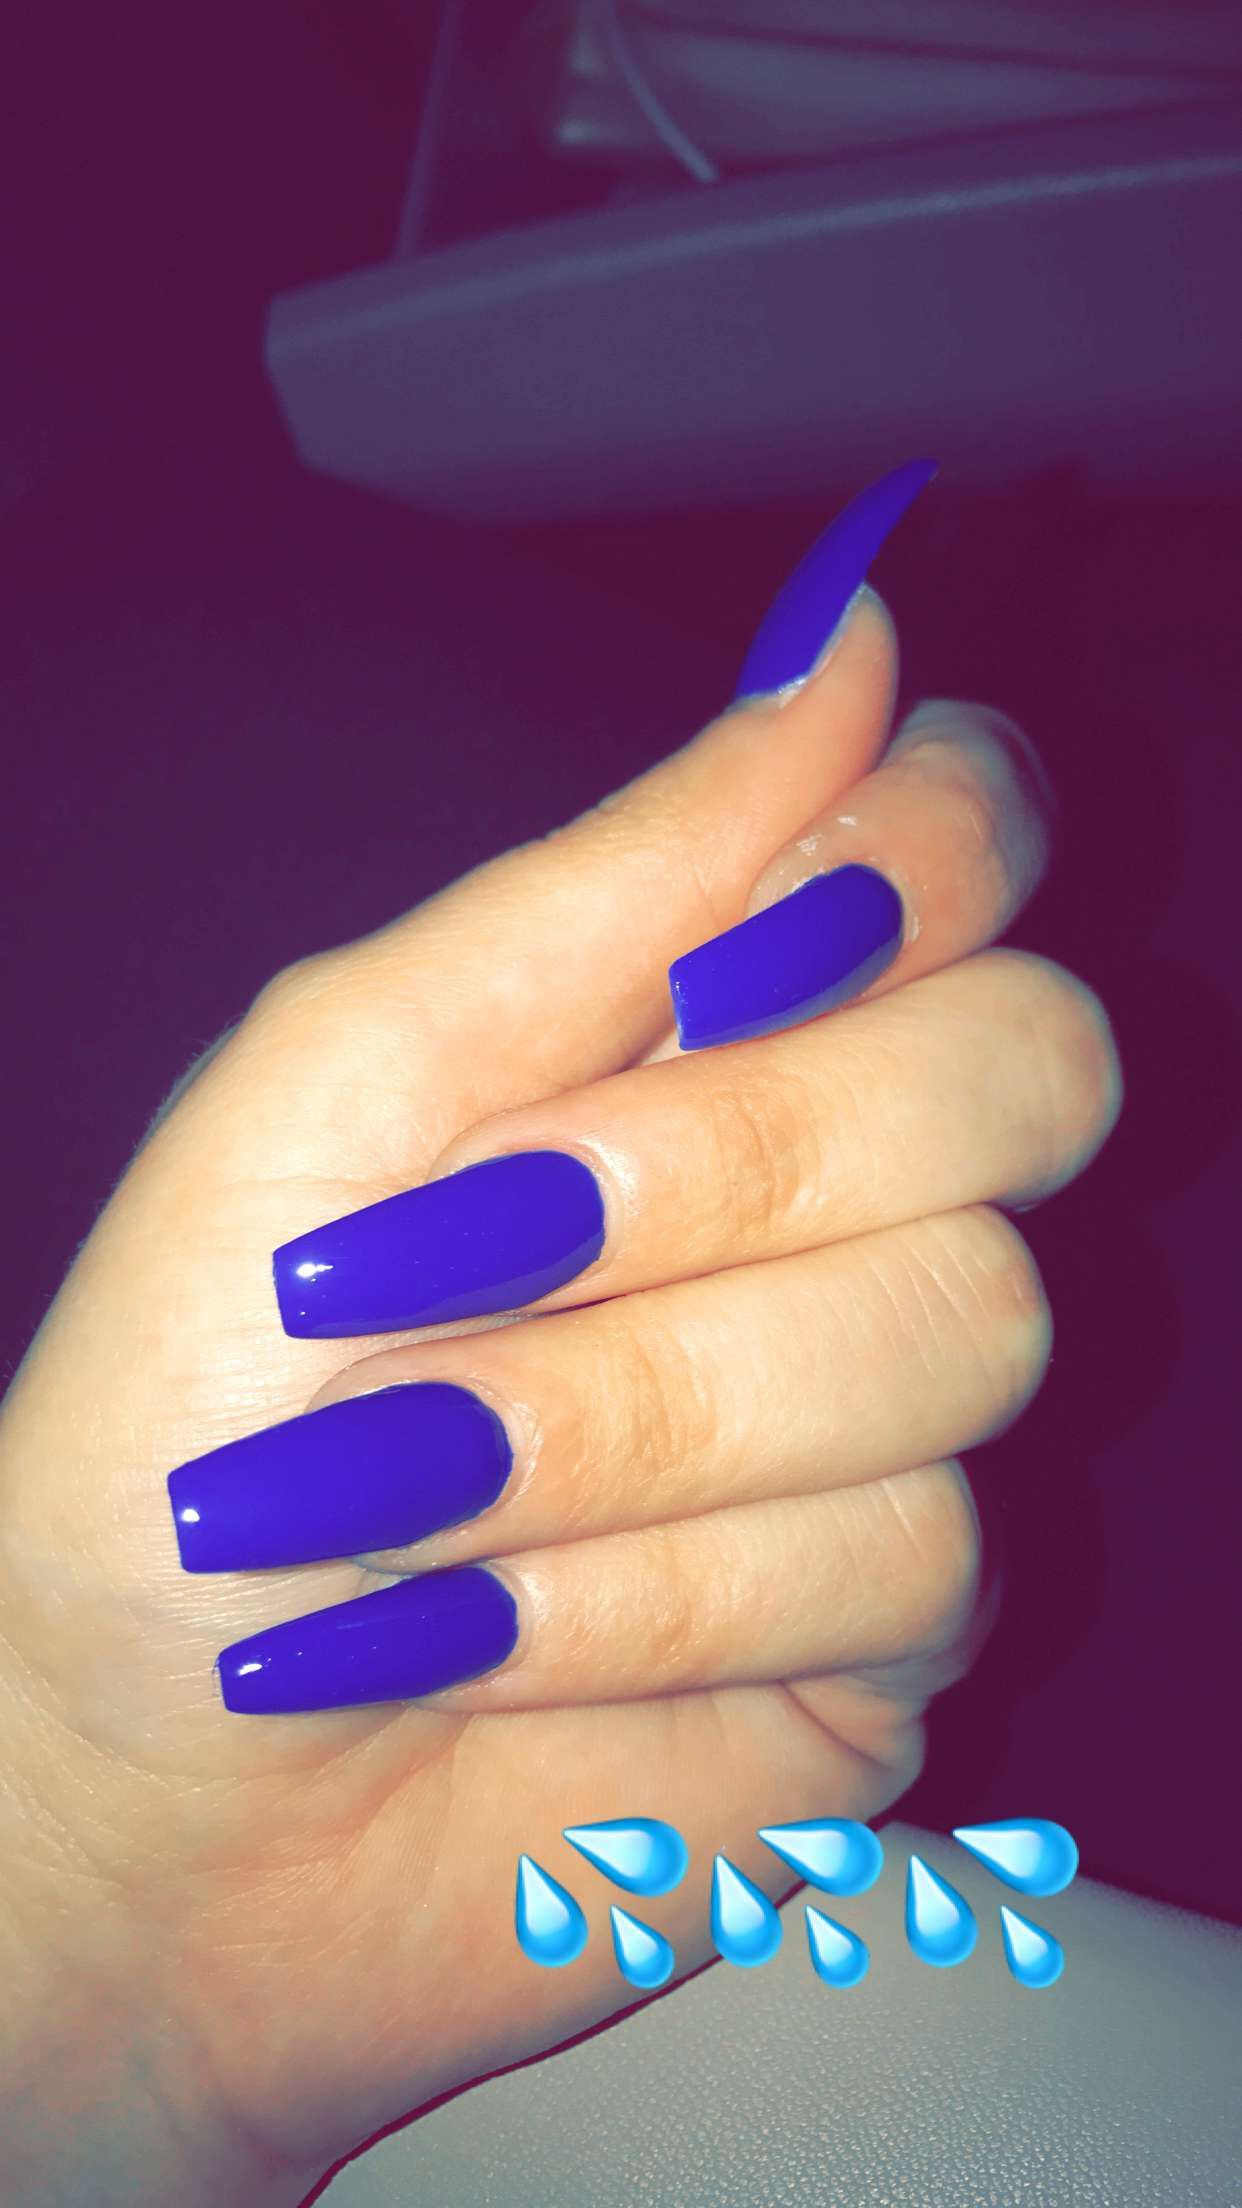 blue long nails 4. double team